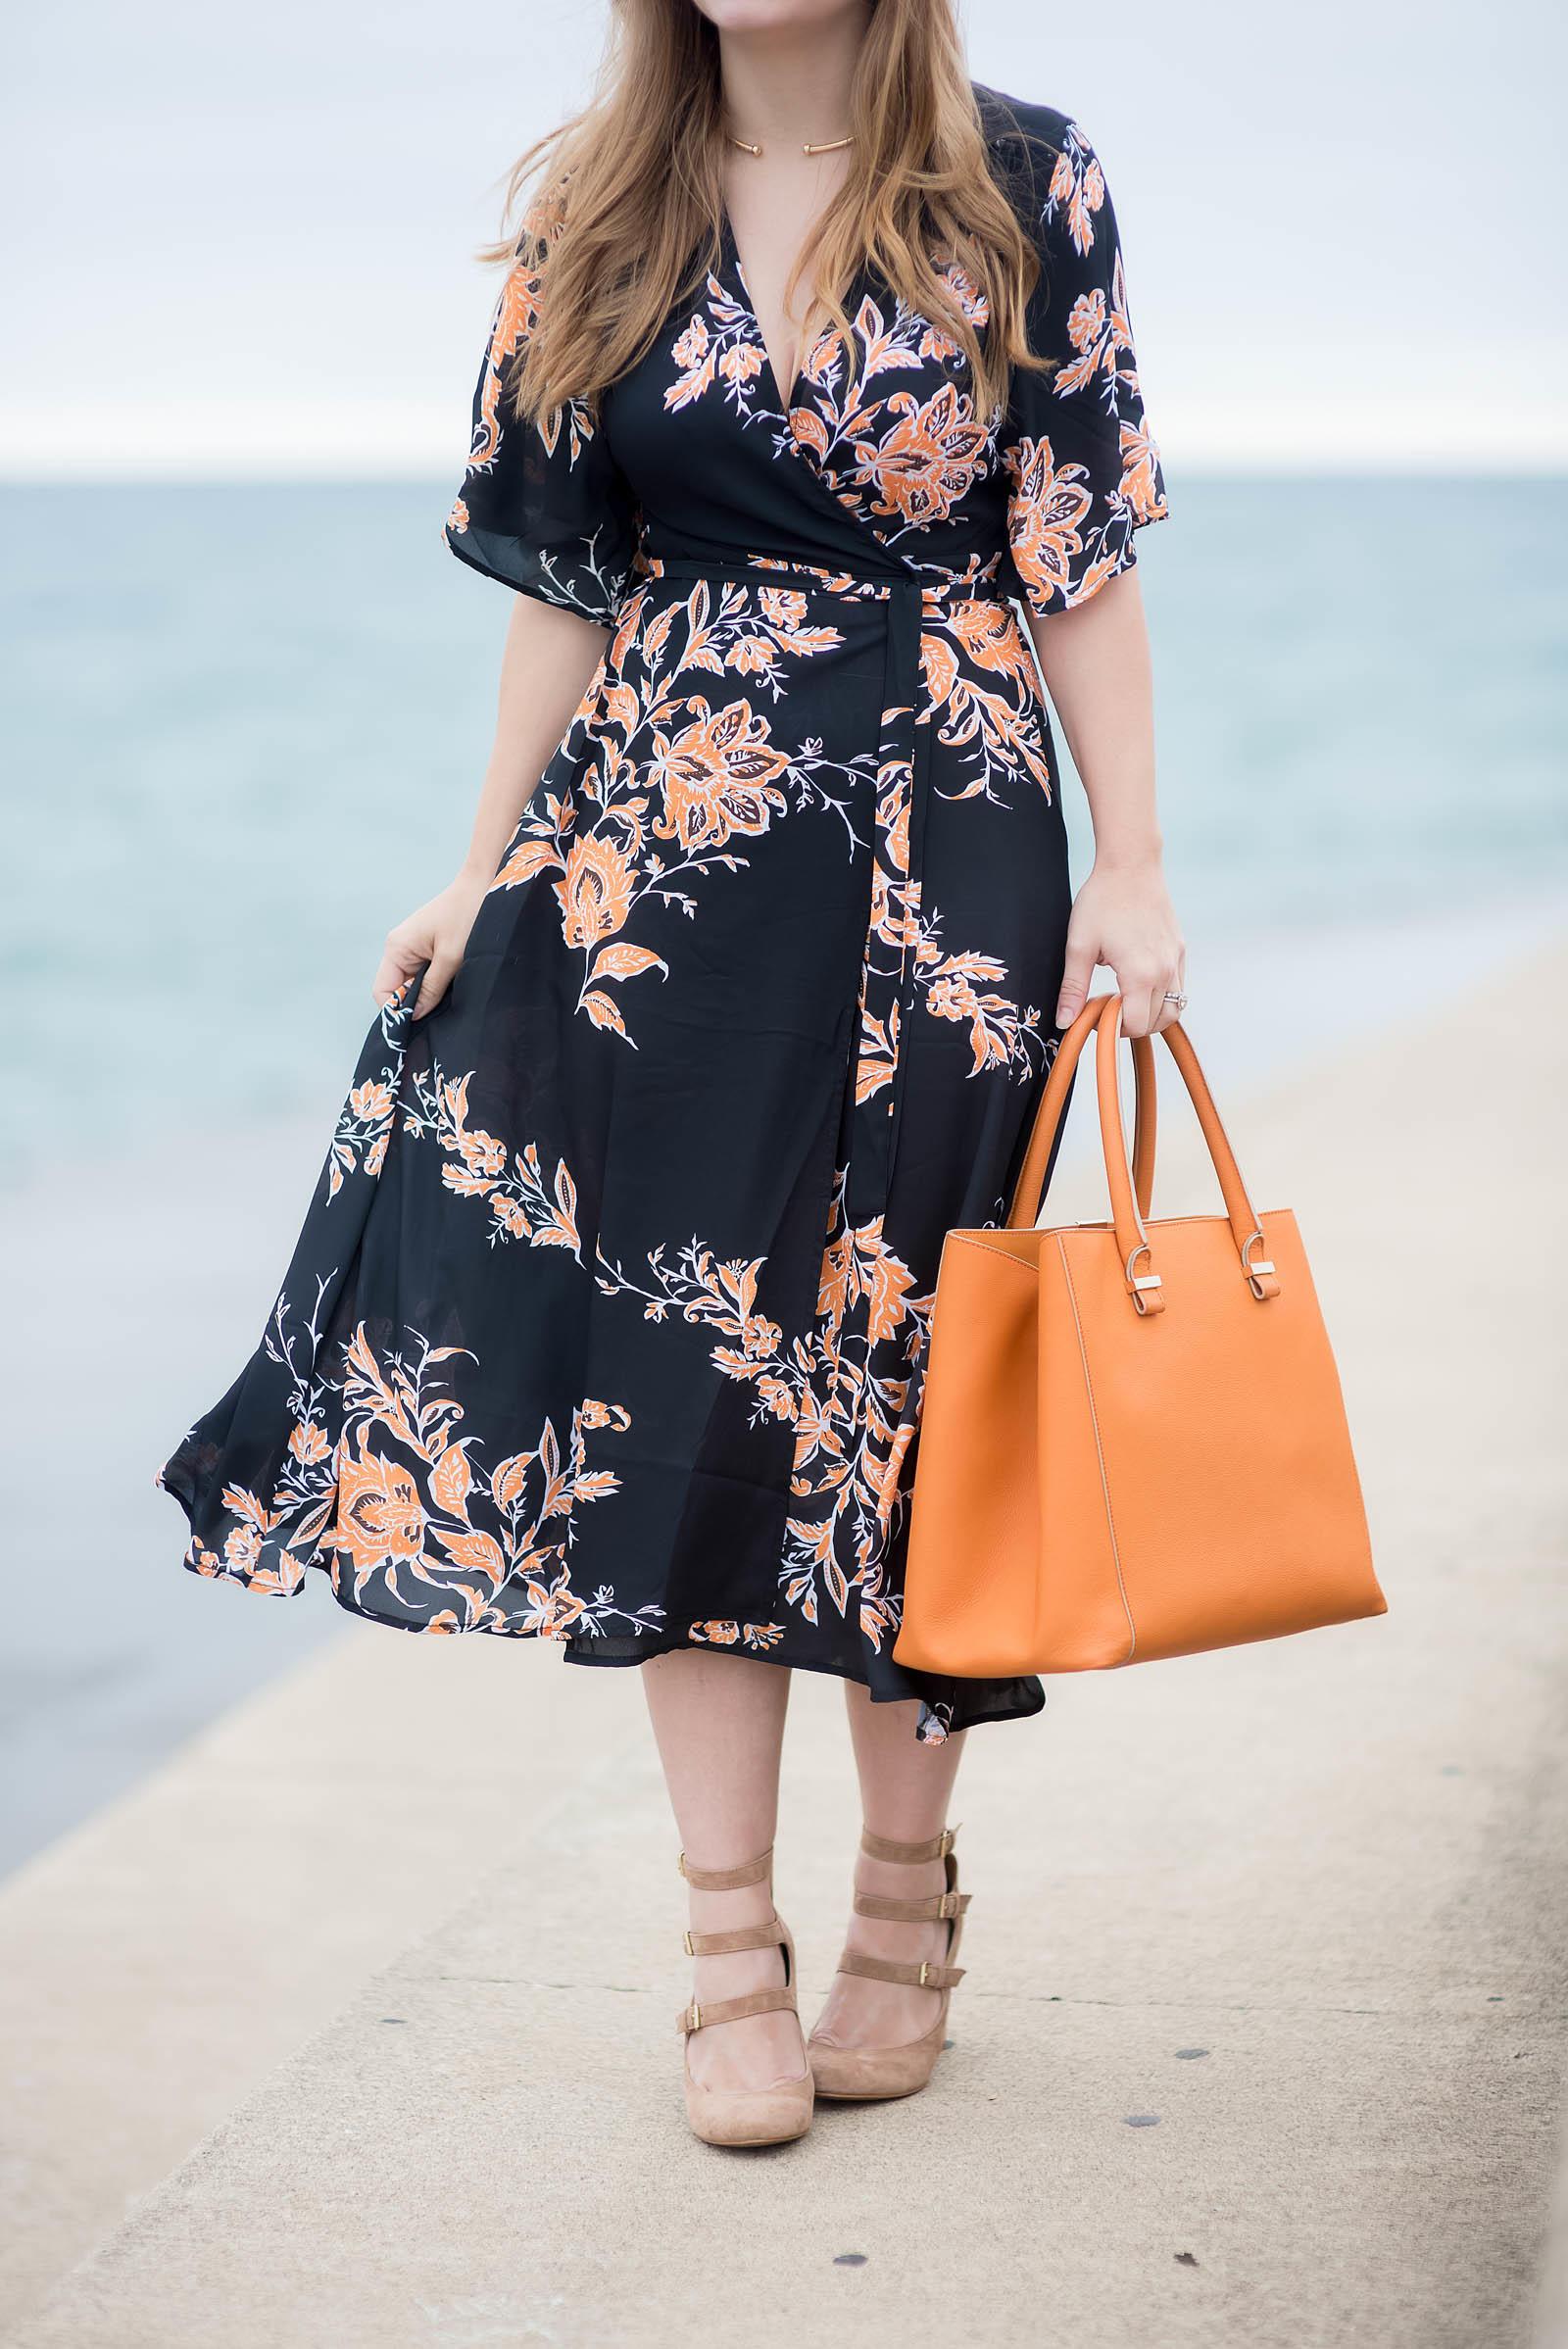 Orange Black Floral Kimono Dress Outfit